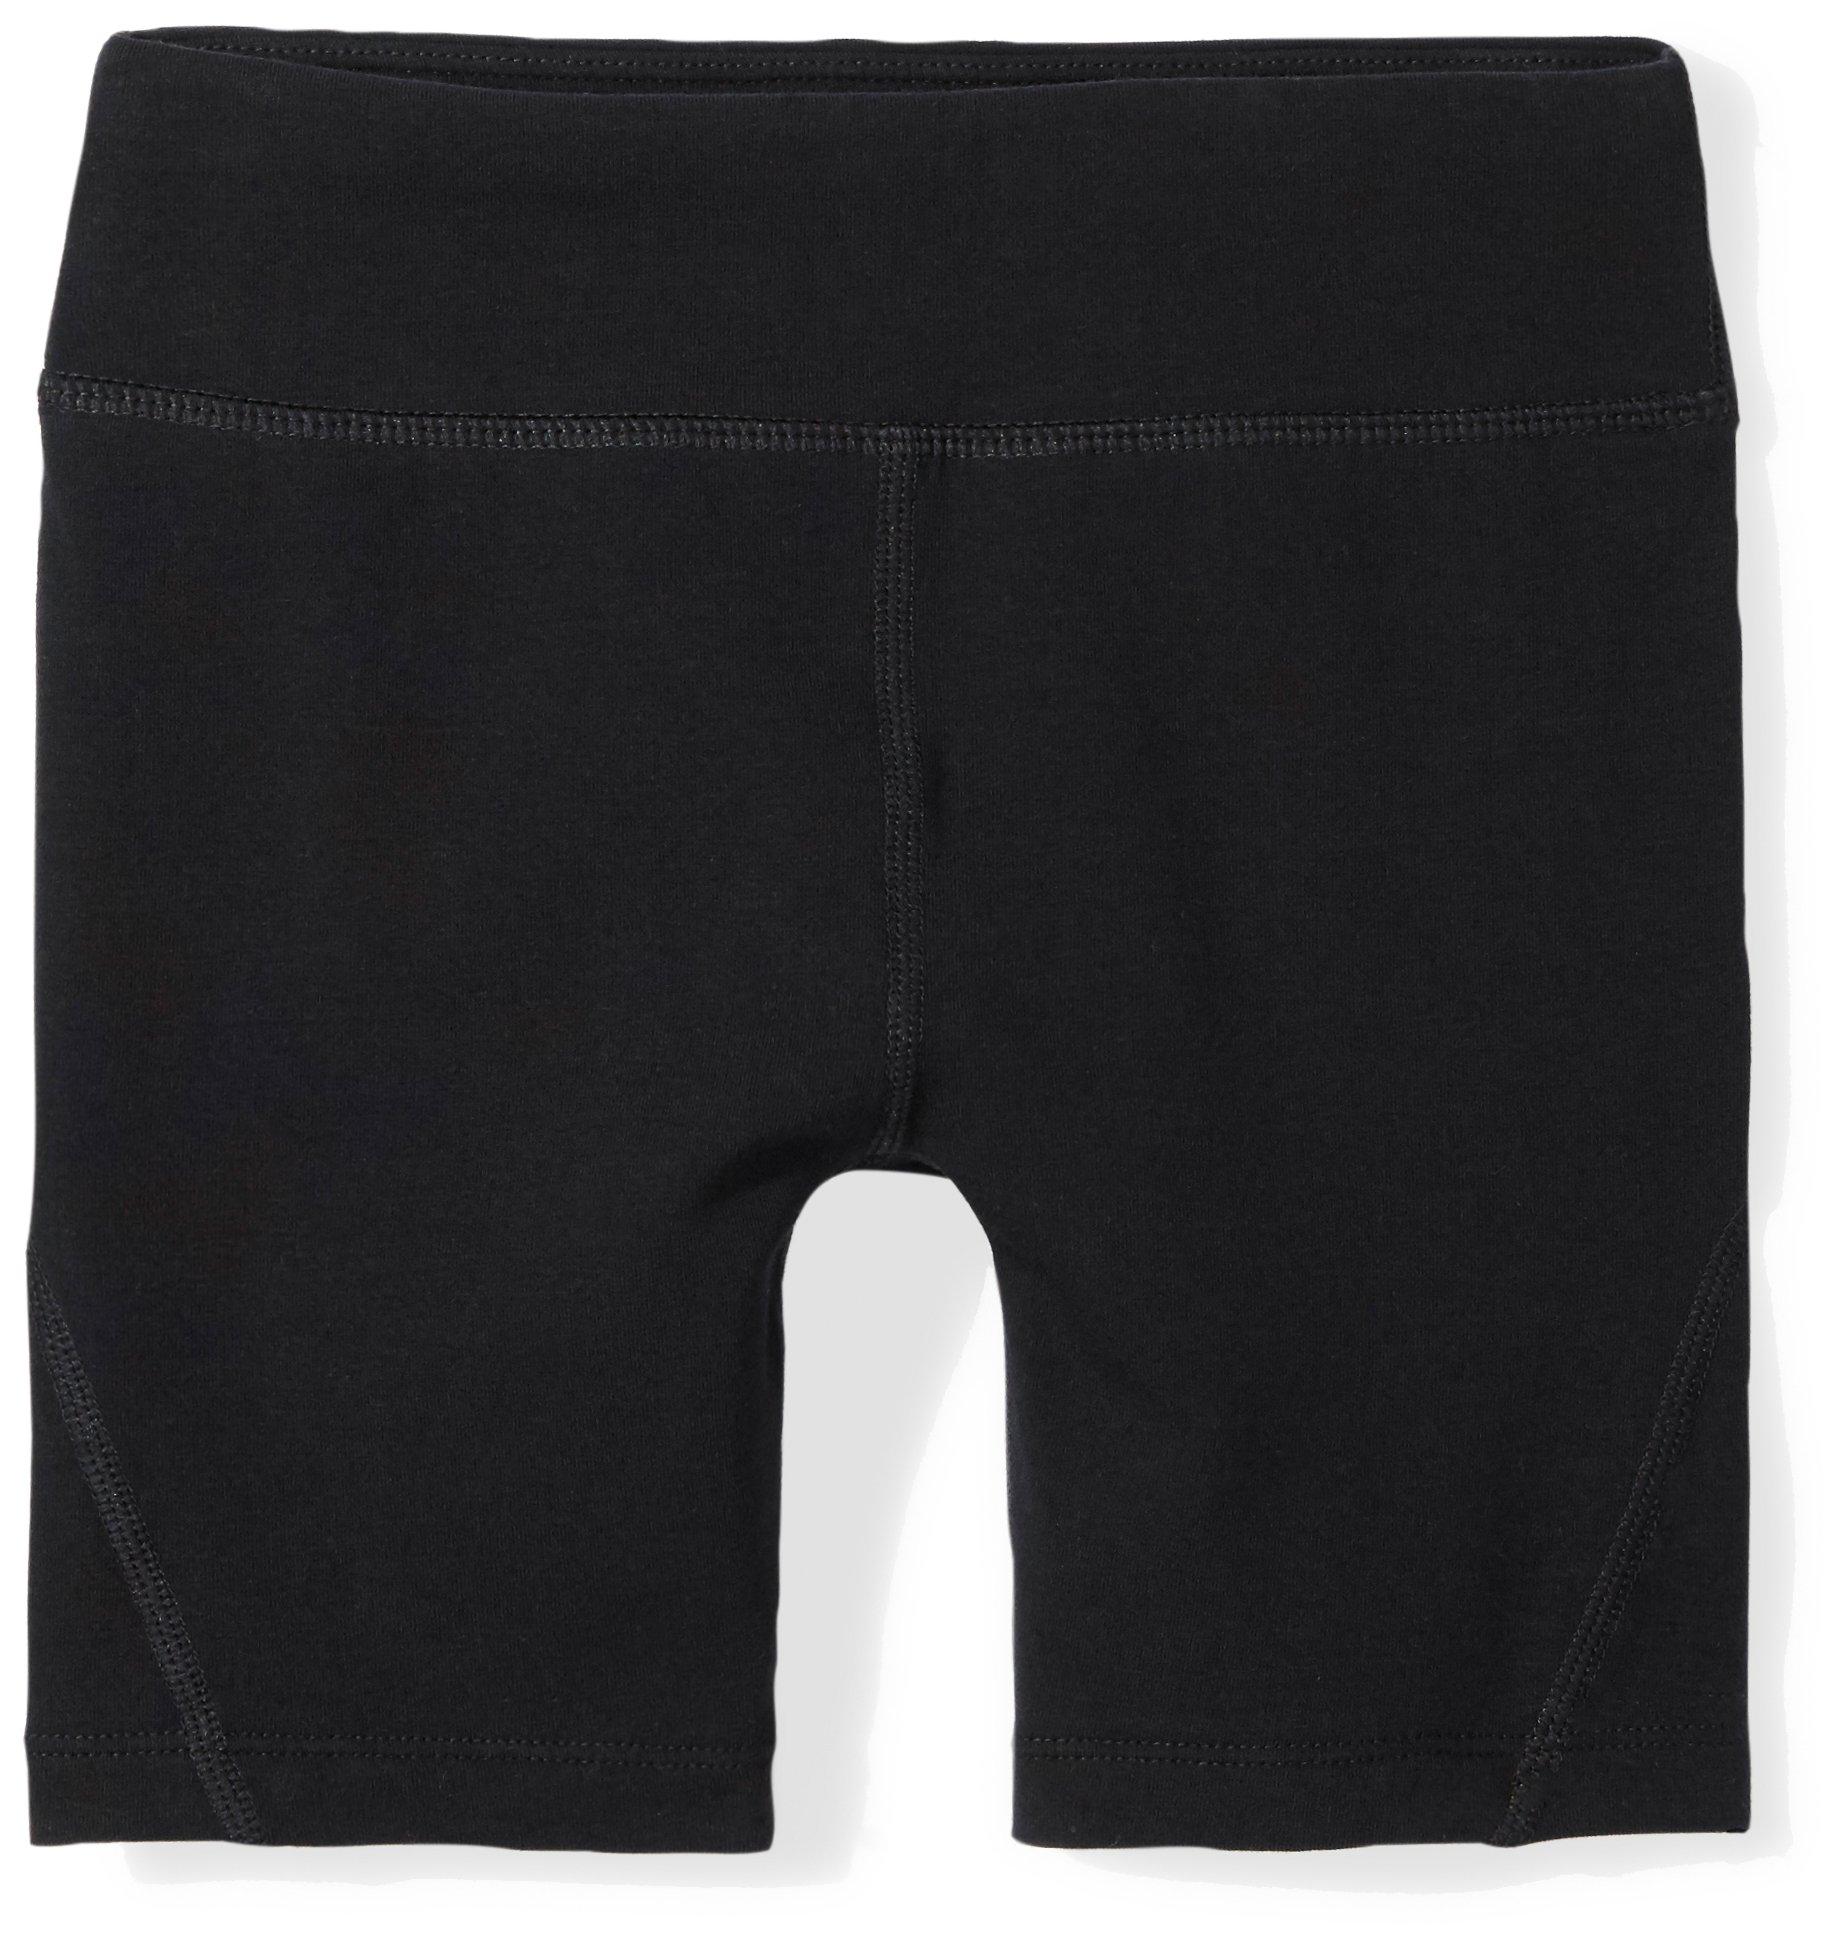 Starter Girls' 5'' Performance Cotton Training Bike Short, Prime Exclusive, Black, XL (14/16)